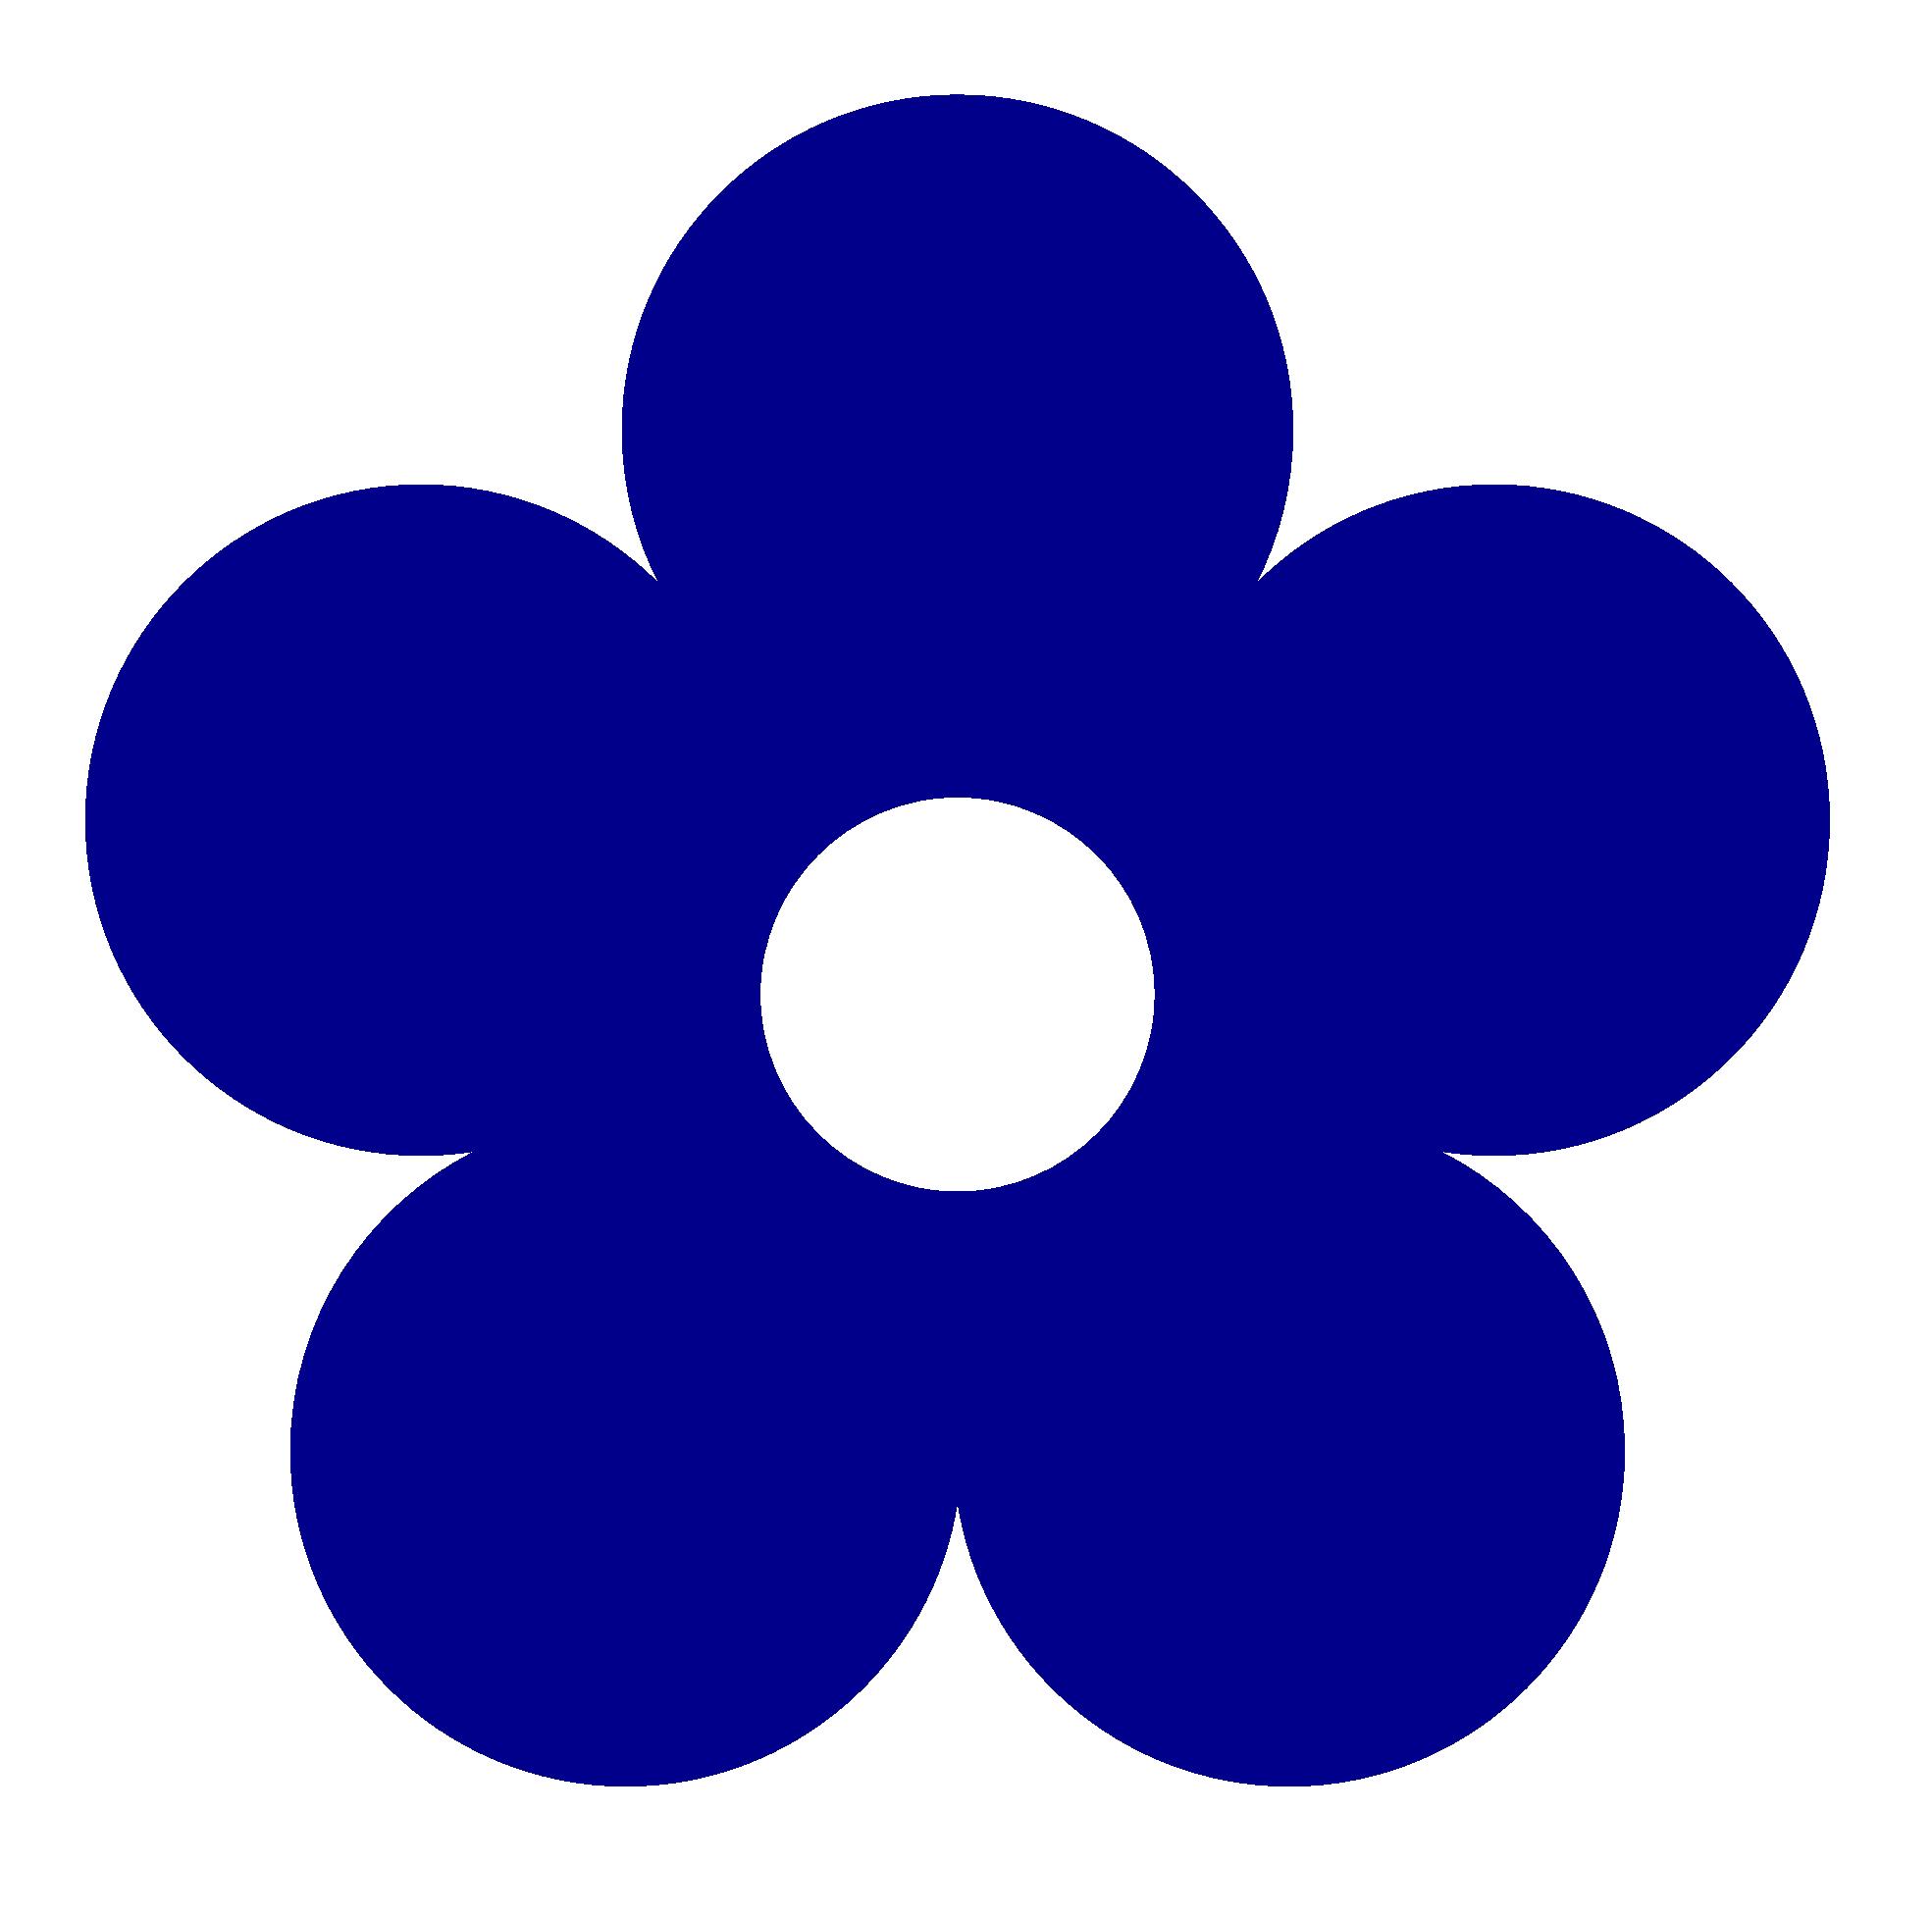 Floral clipart elegant flower Dark Clipart  Blue Flower